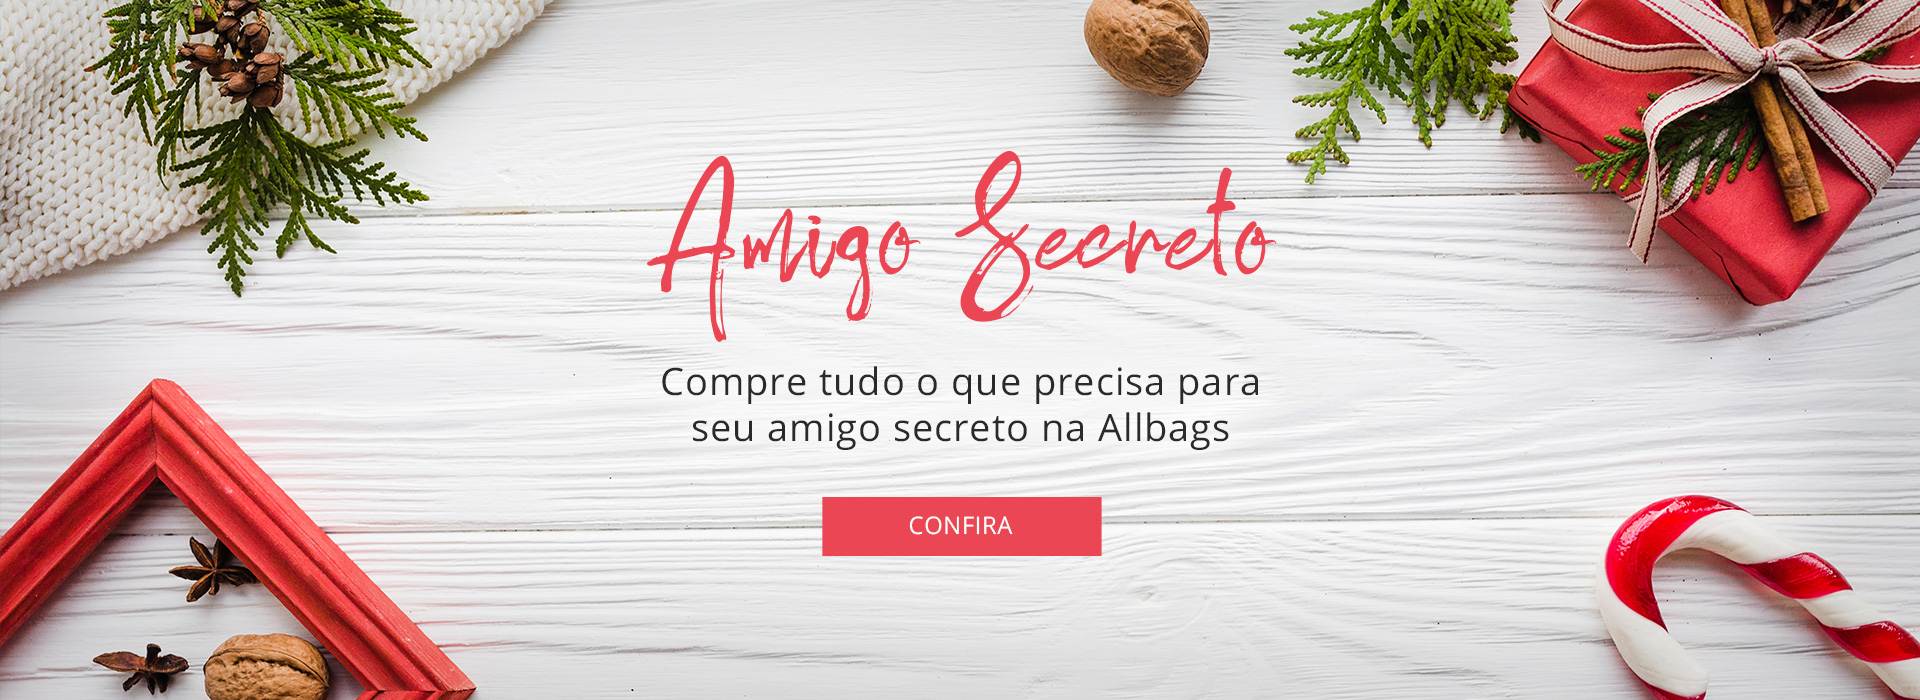 Banner 4 - Amigo Secreto